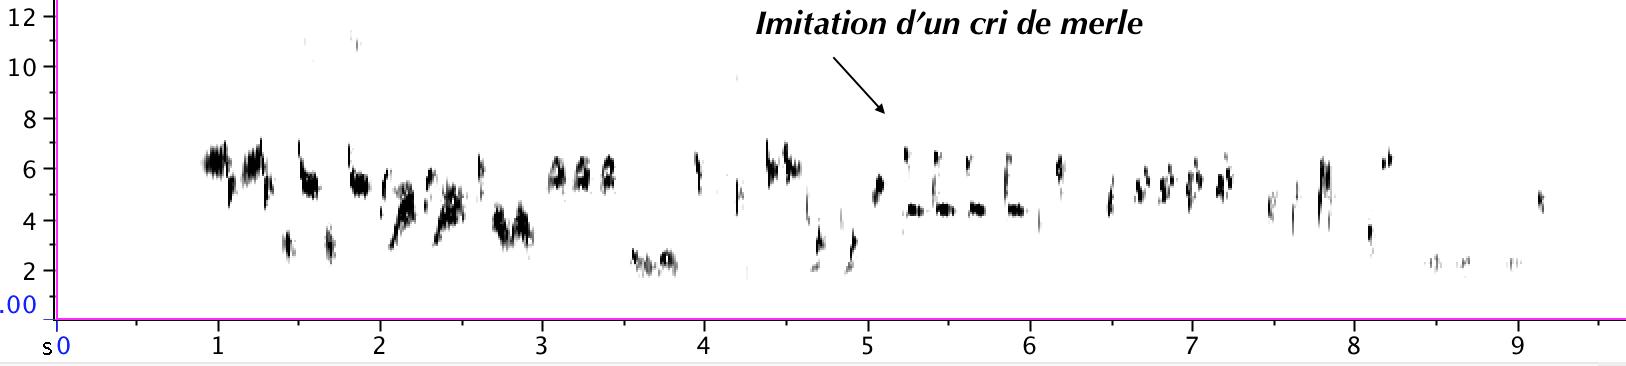 https://cdnfiles1.biolovision.net/www.gobg.ch/userfiles/sonagramme_1.png